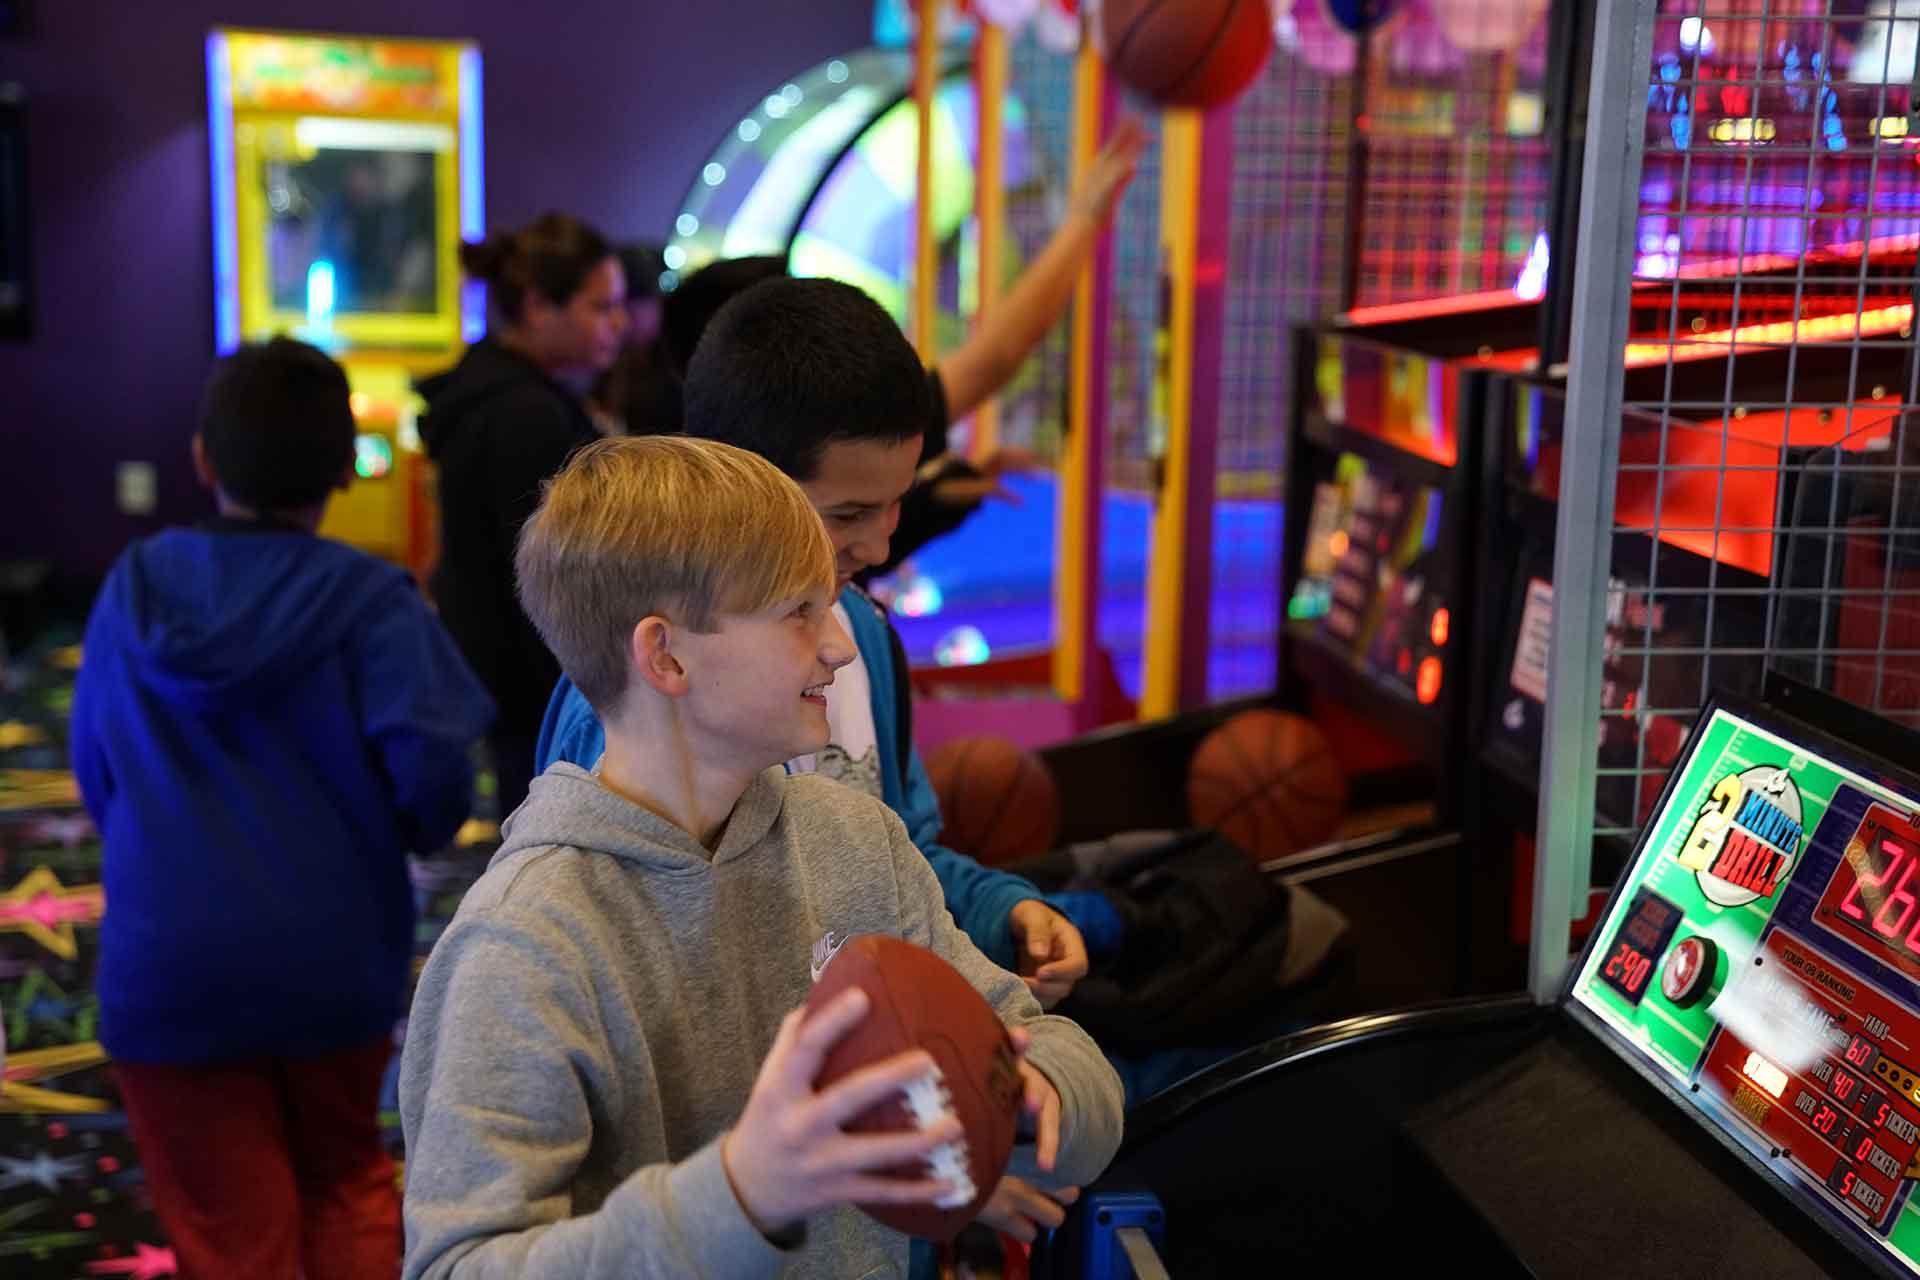 Arcade Game Fun!